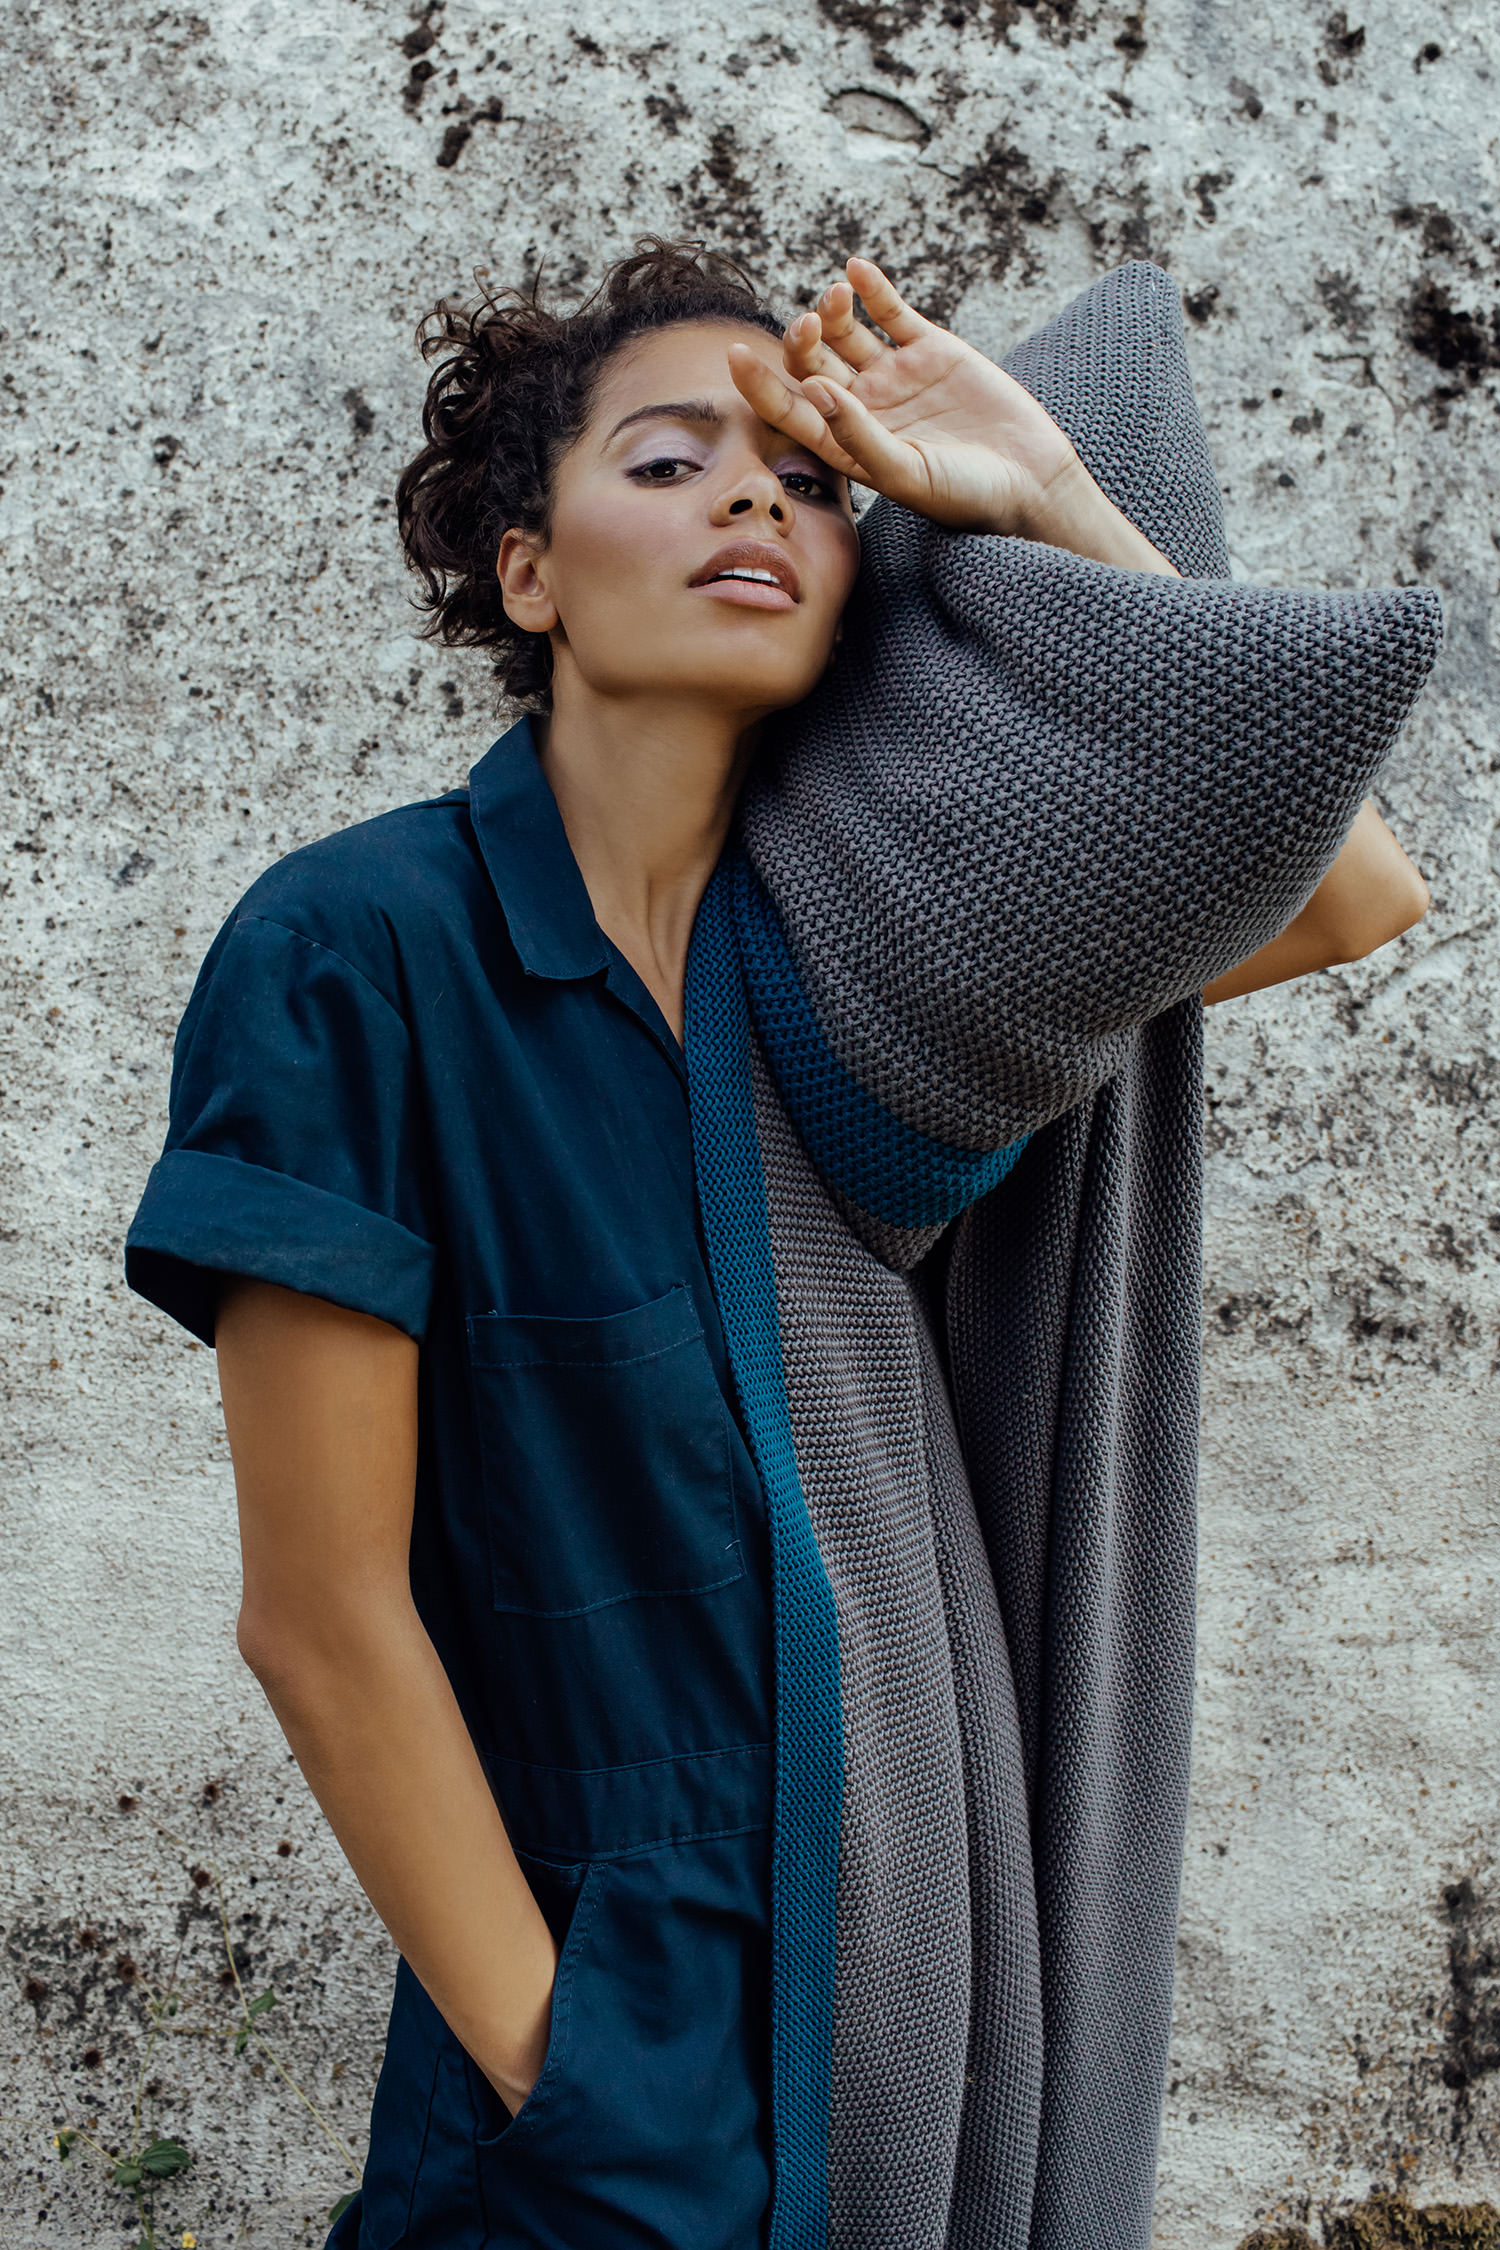 Duesseldorf-Fotograf-Fashion-Beauty-Anna-Fichtner-O4